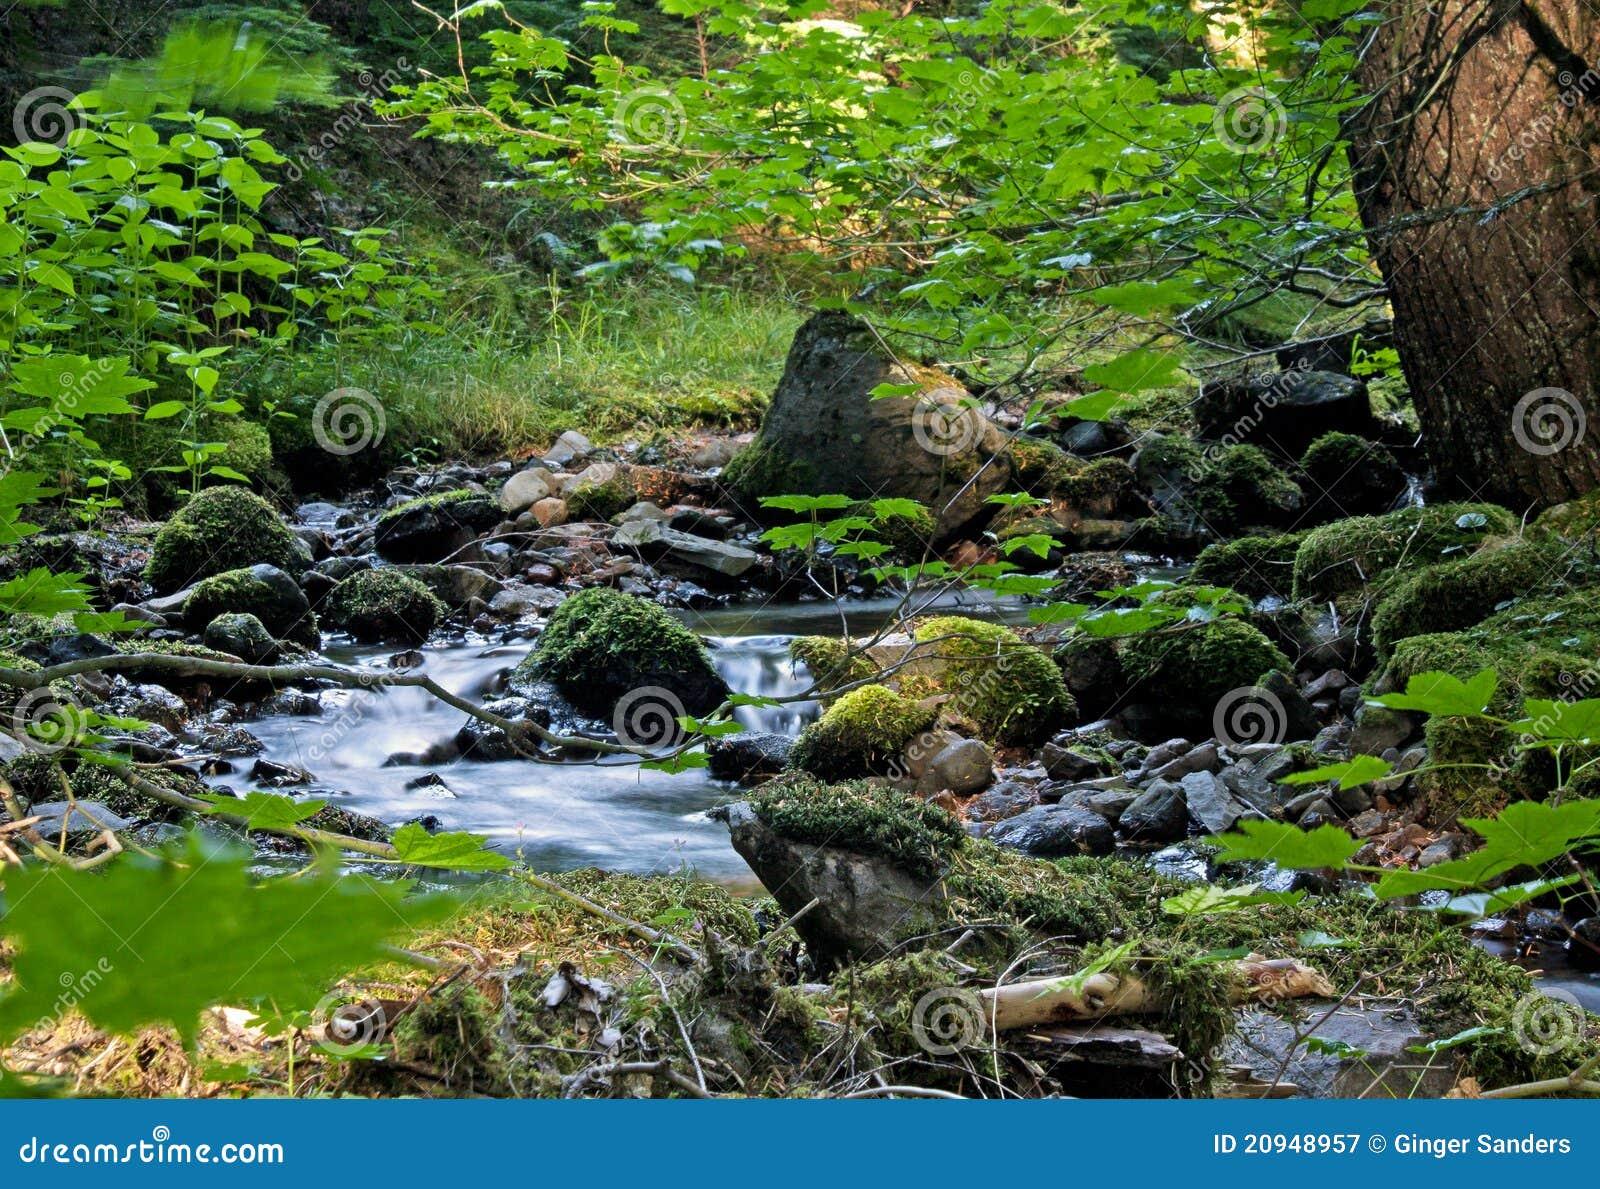 Peaceful Mountain Stream With Lush Greenery